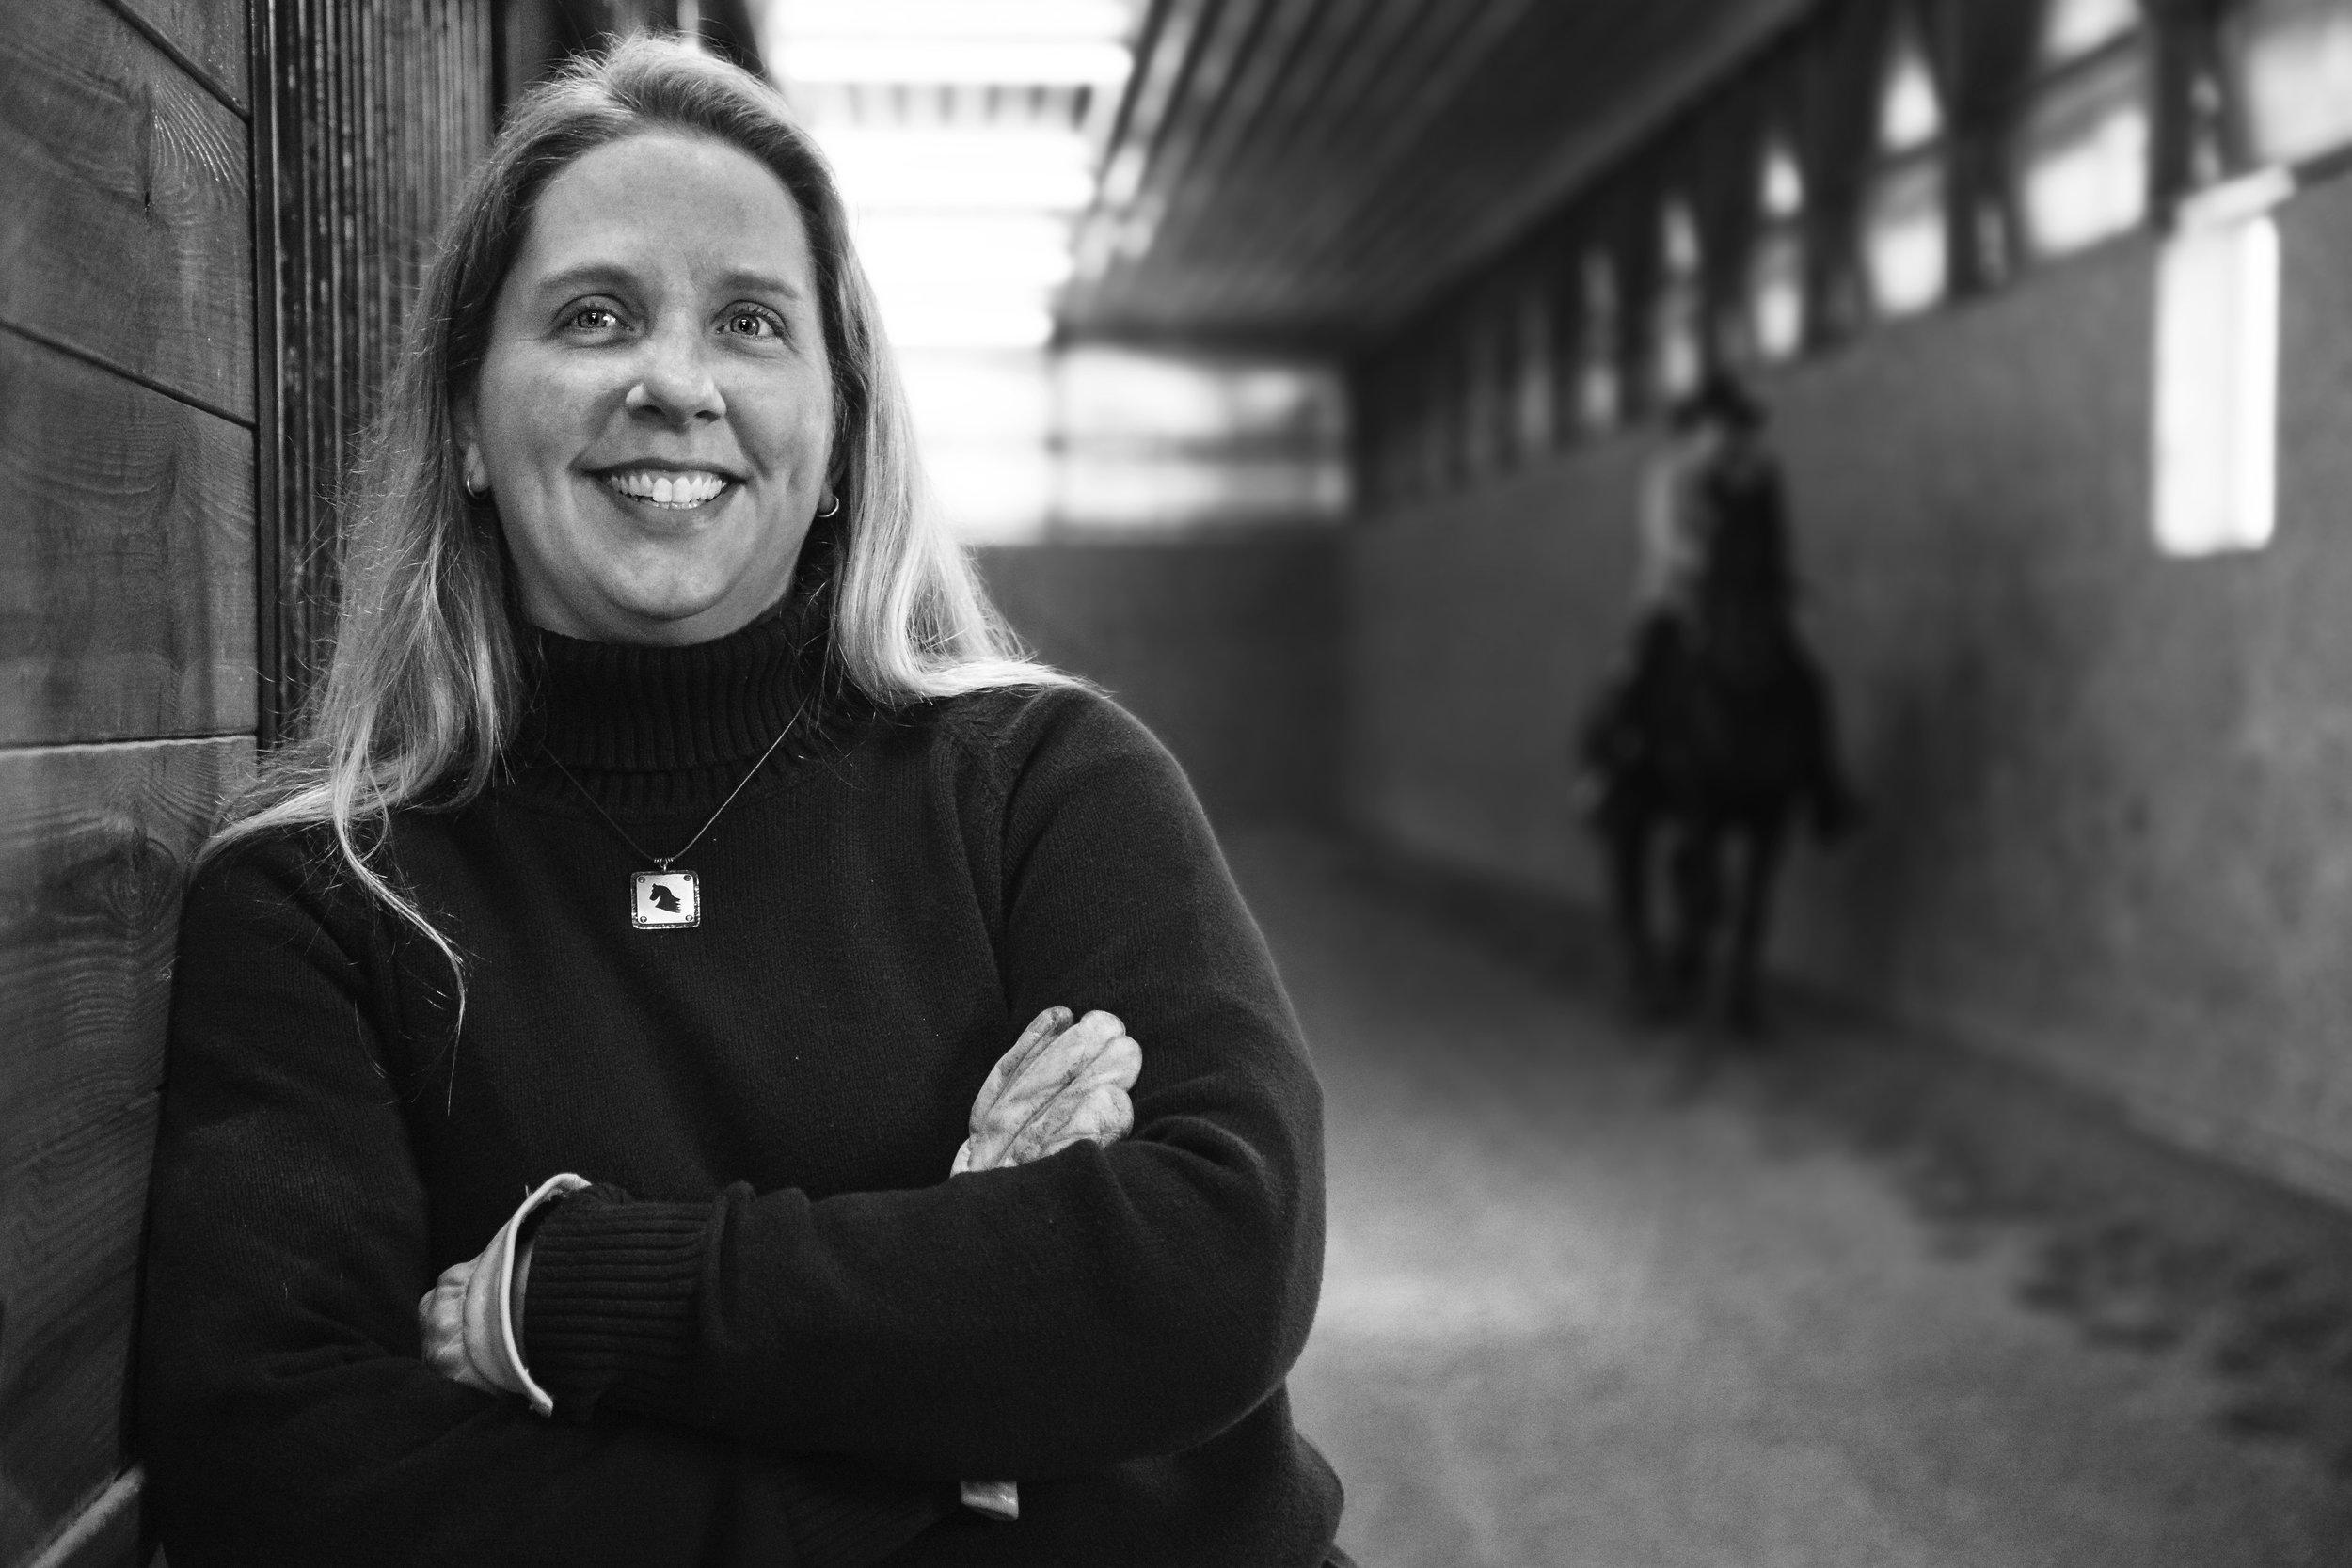 Leslie Melvin - Owner and Trainer